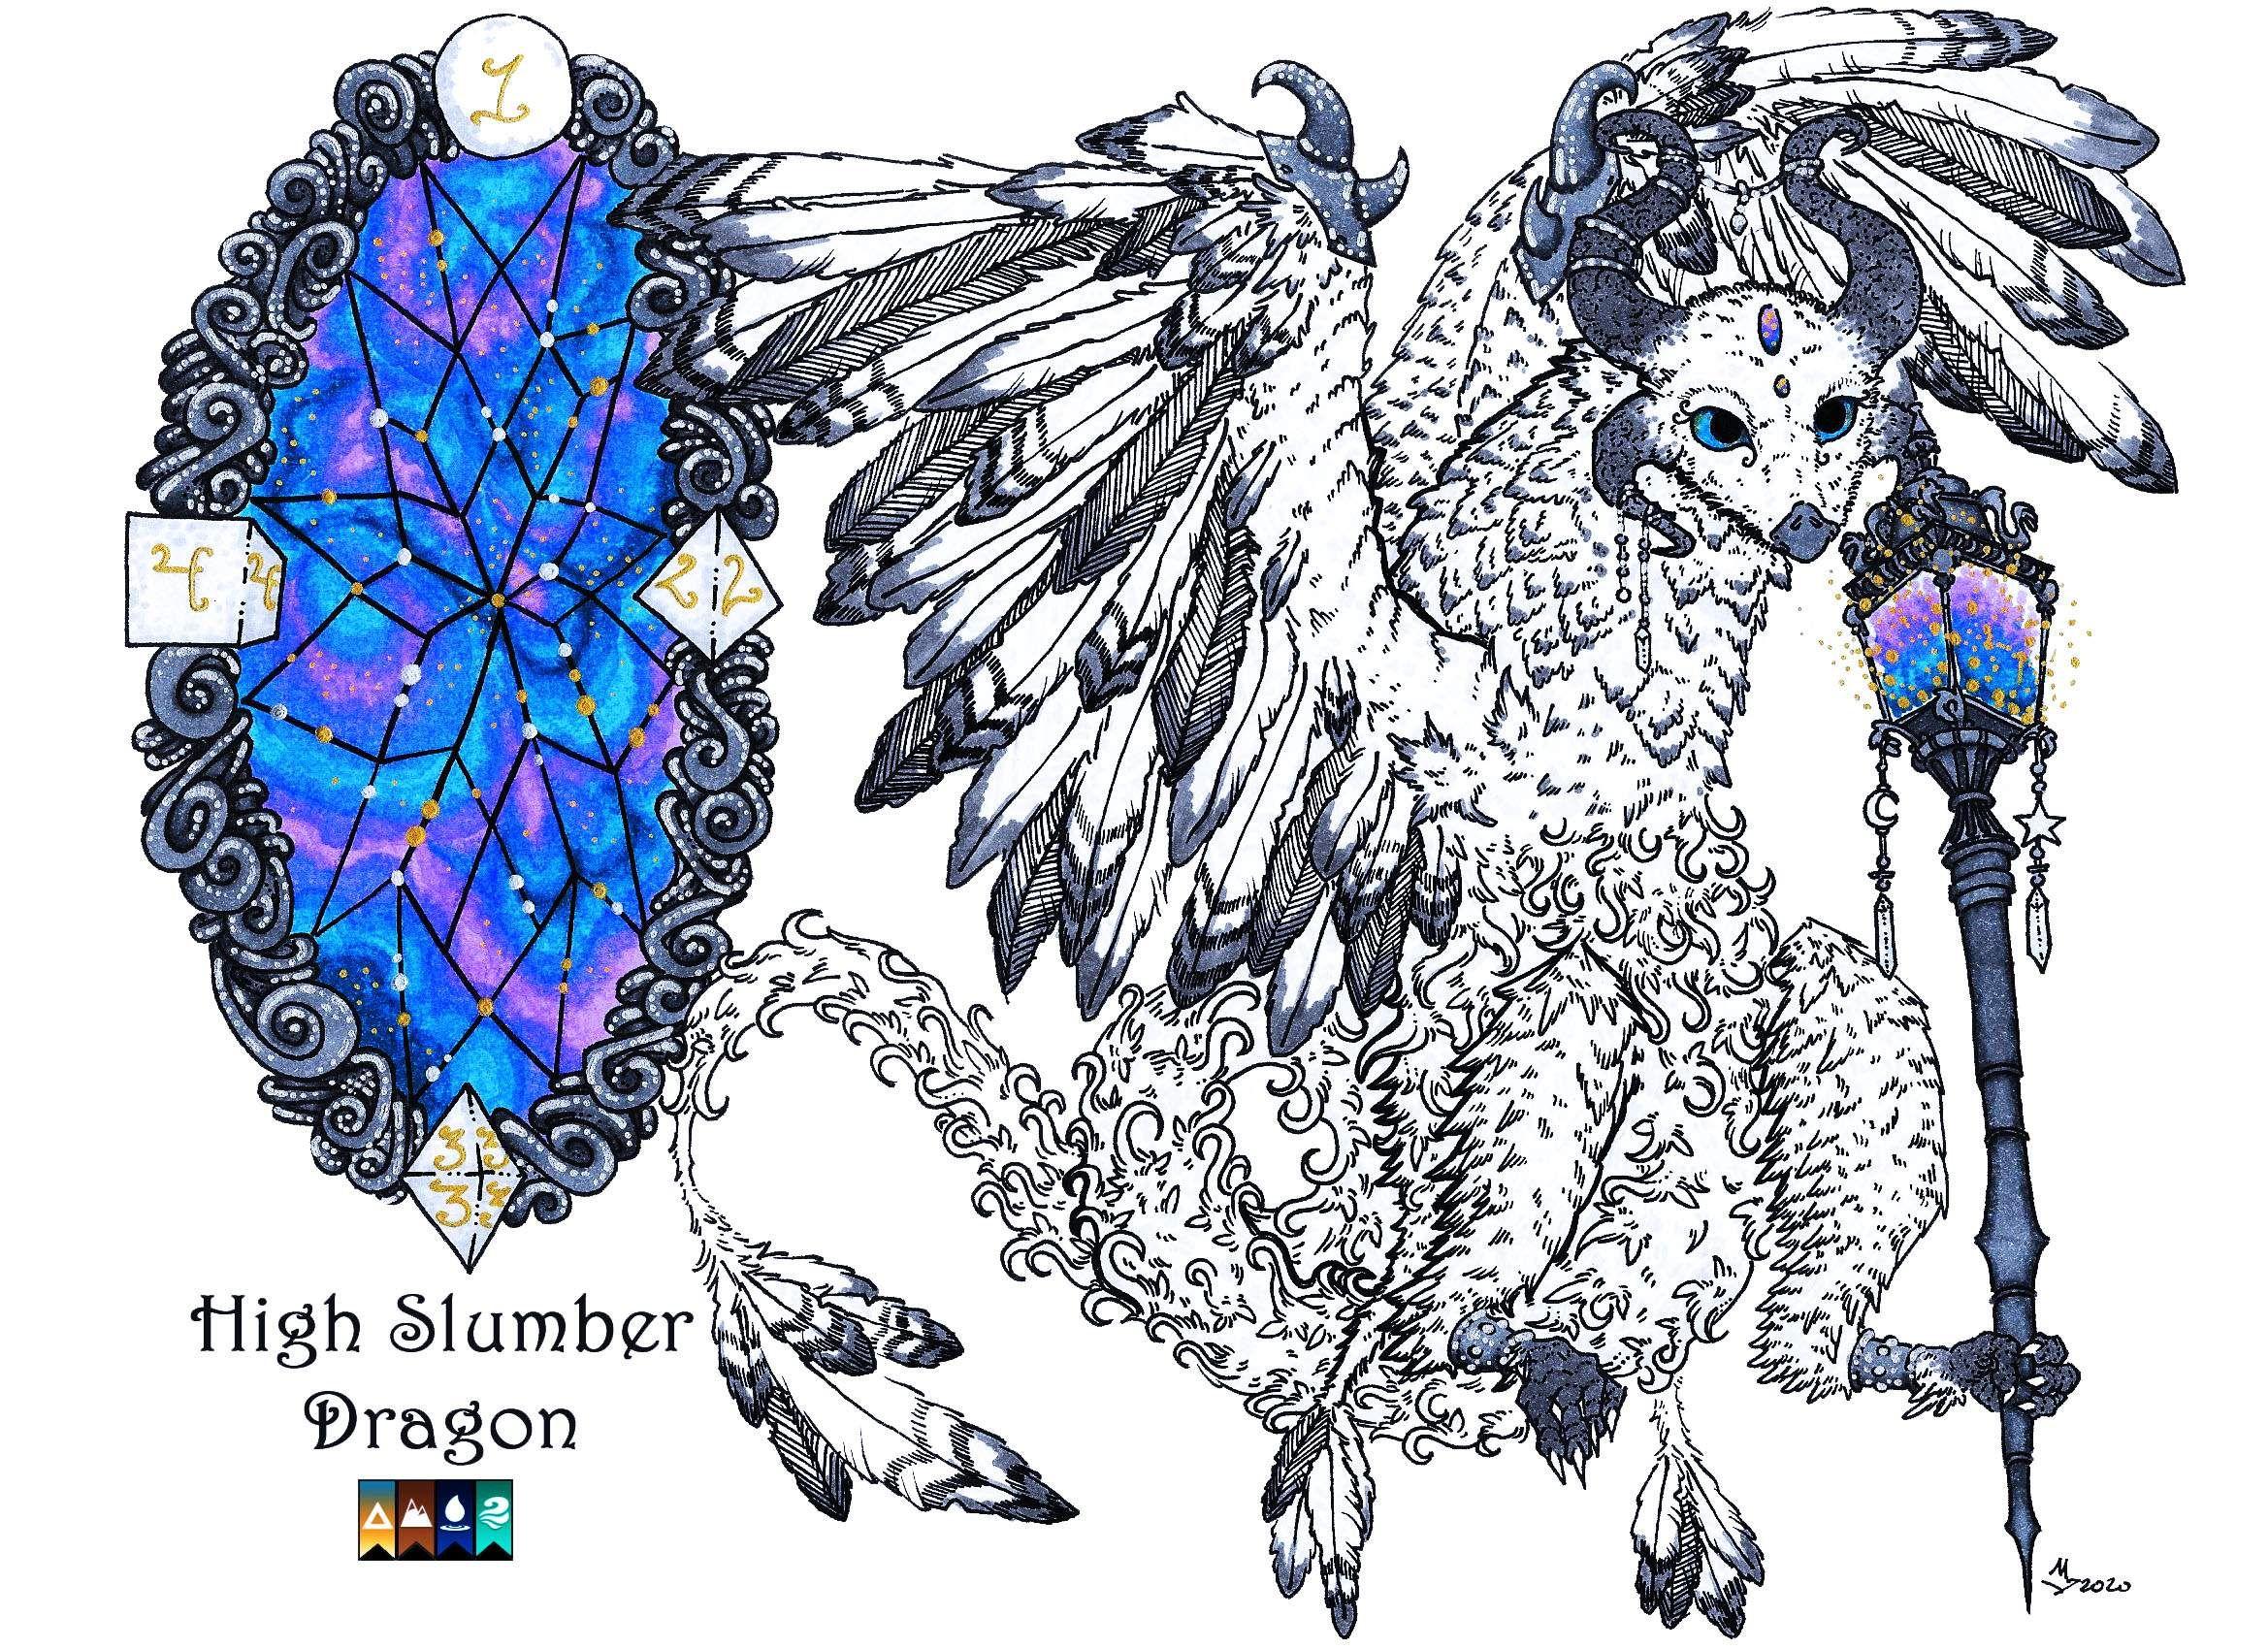 0_1614896875502_High Slumber Dragon, Anthony Valencia.jpg